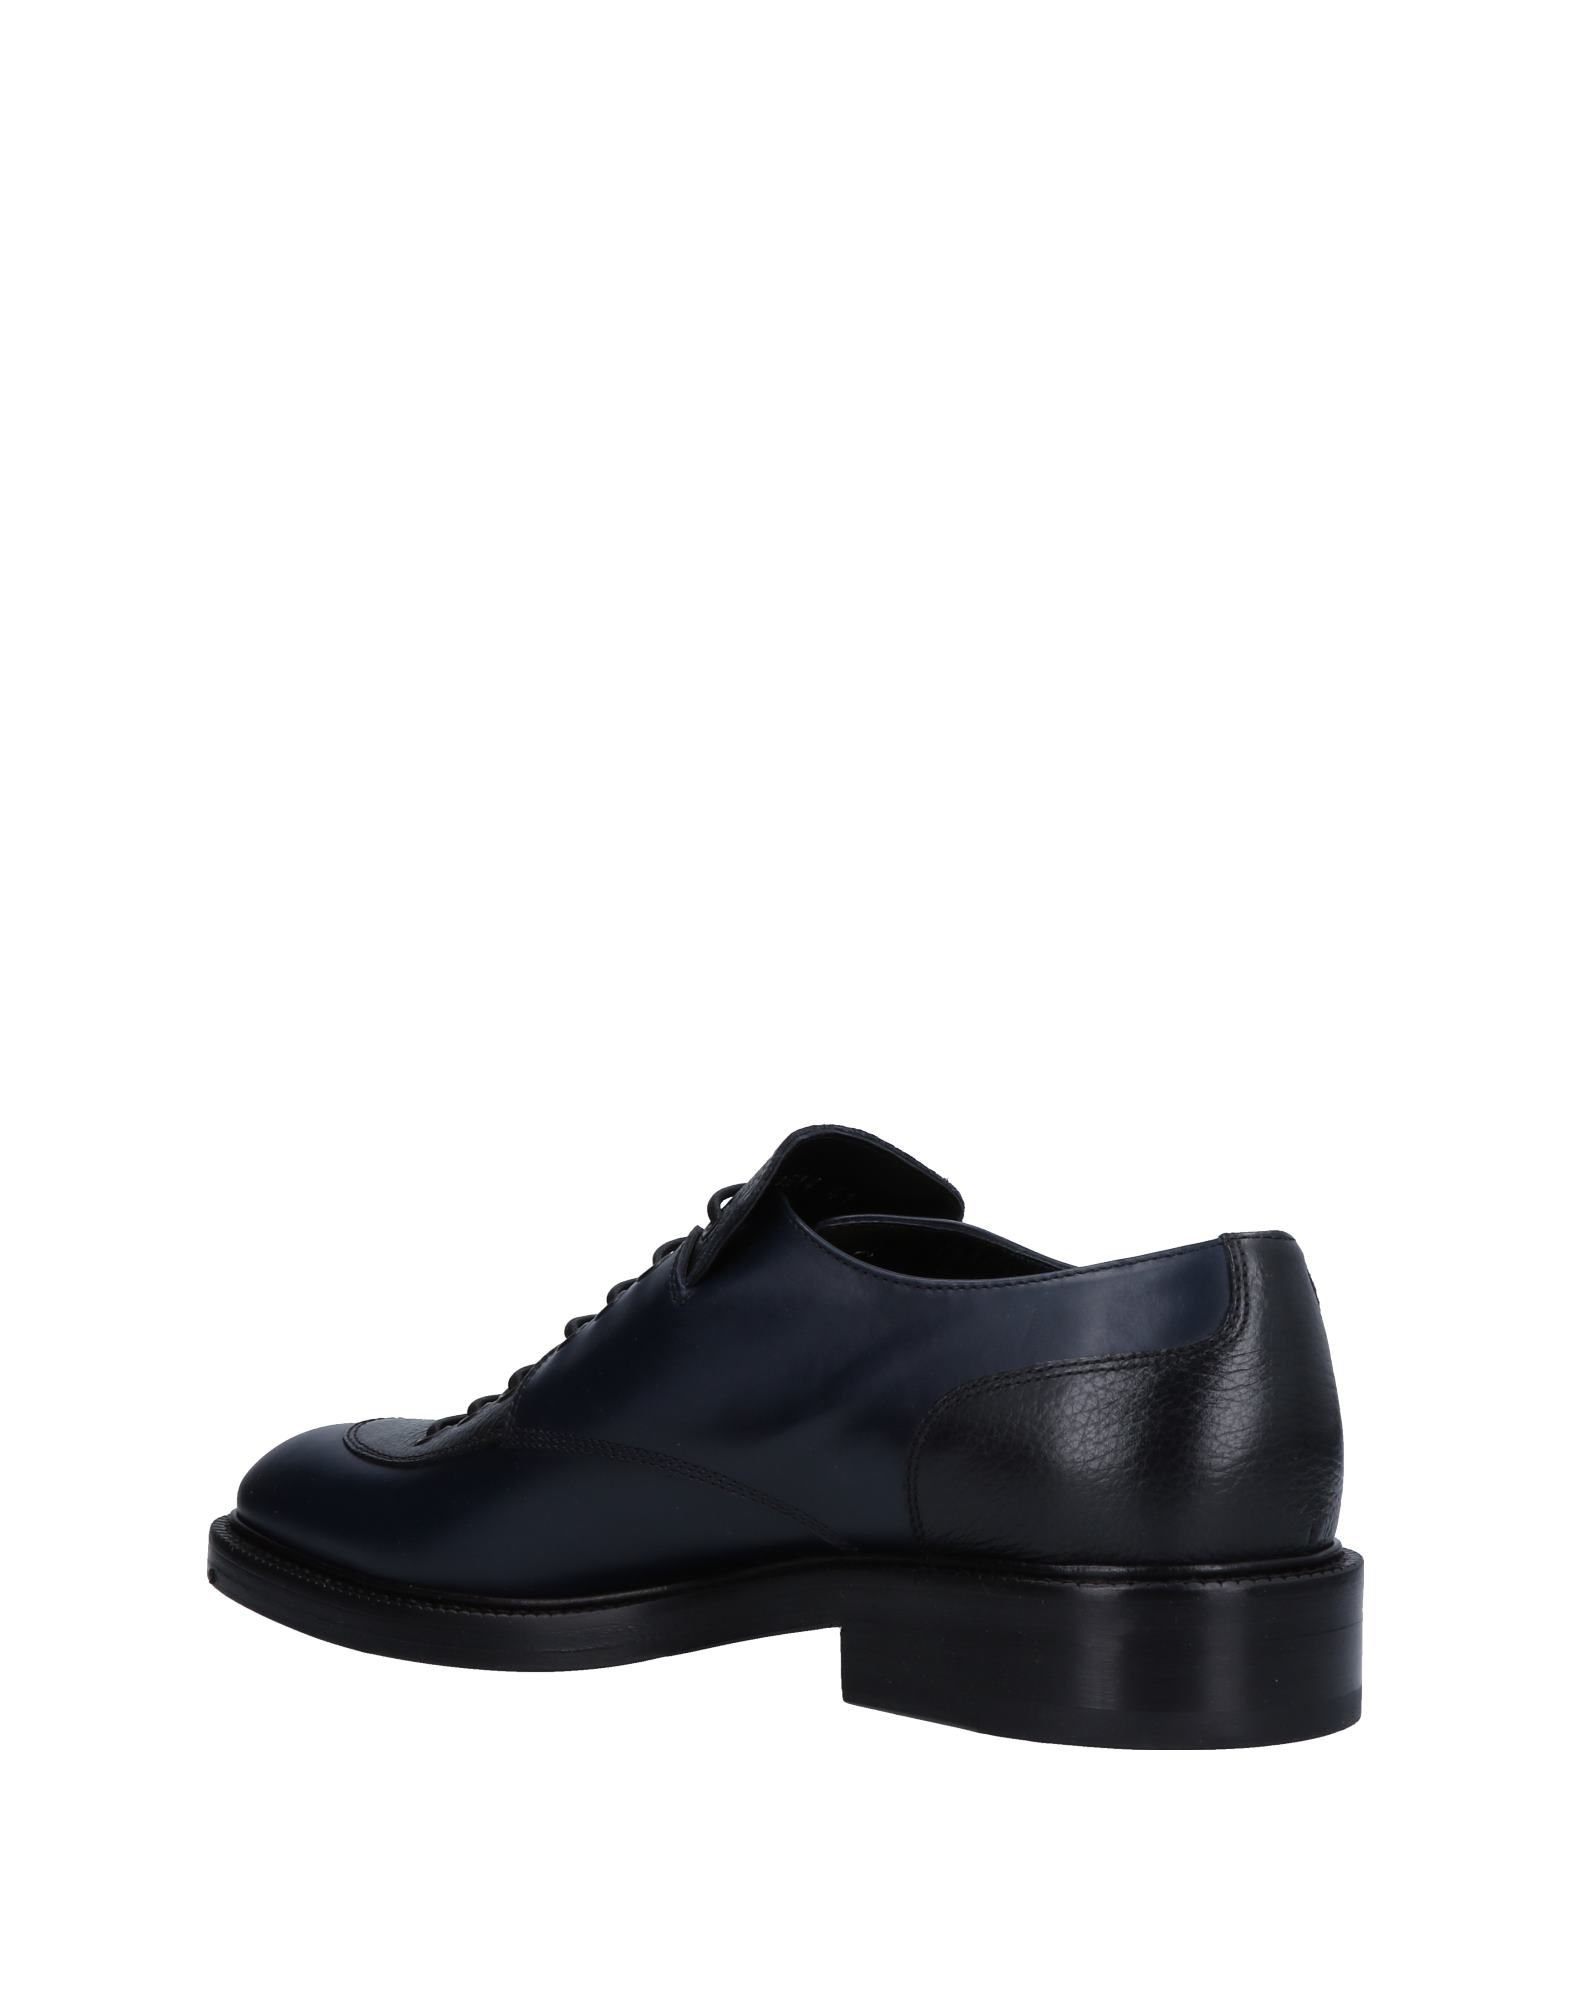 John Galliano Schnürschuhe Herren  11516695XA Gute Qualität beliebte Schuhe